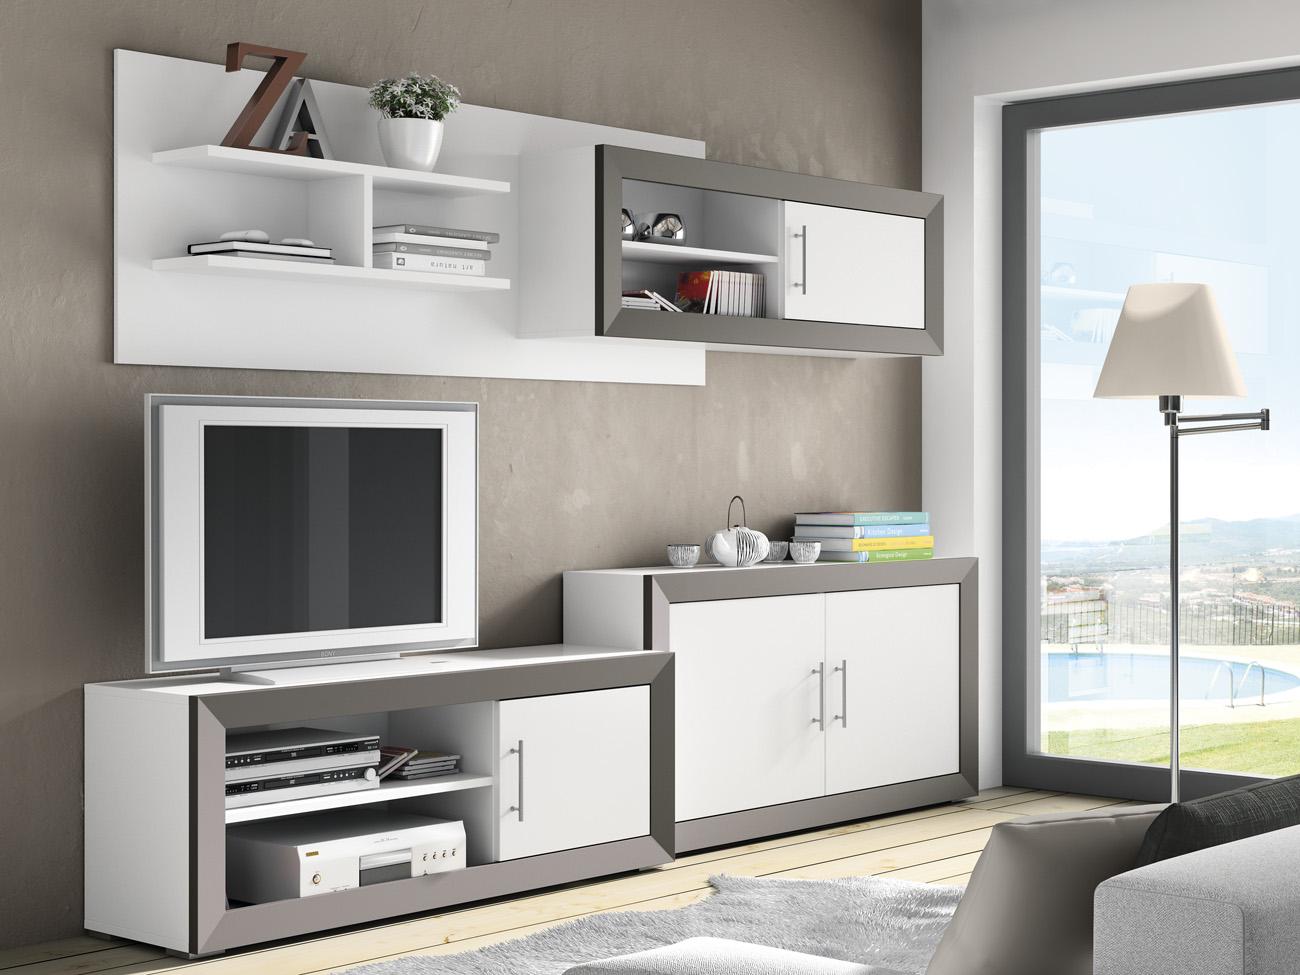 Comedores modernos y baratos muebles dominguez for Catalogo muebles modernos